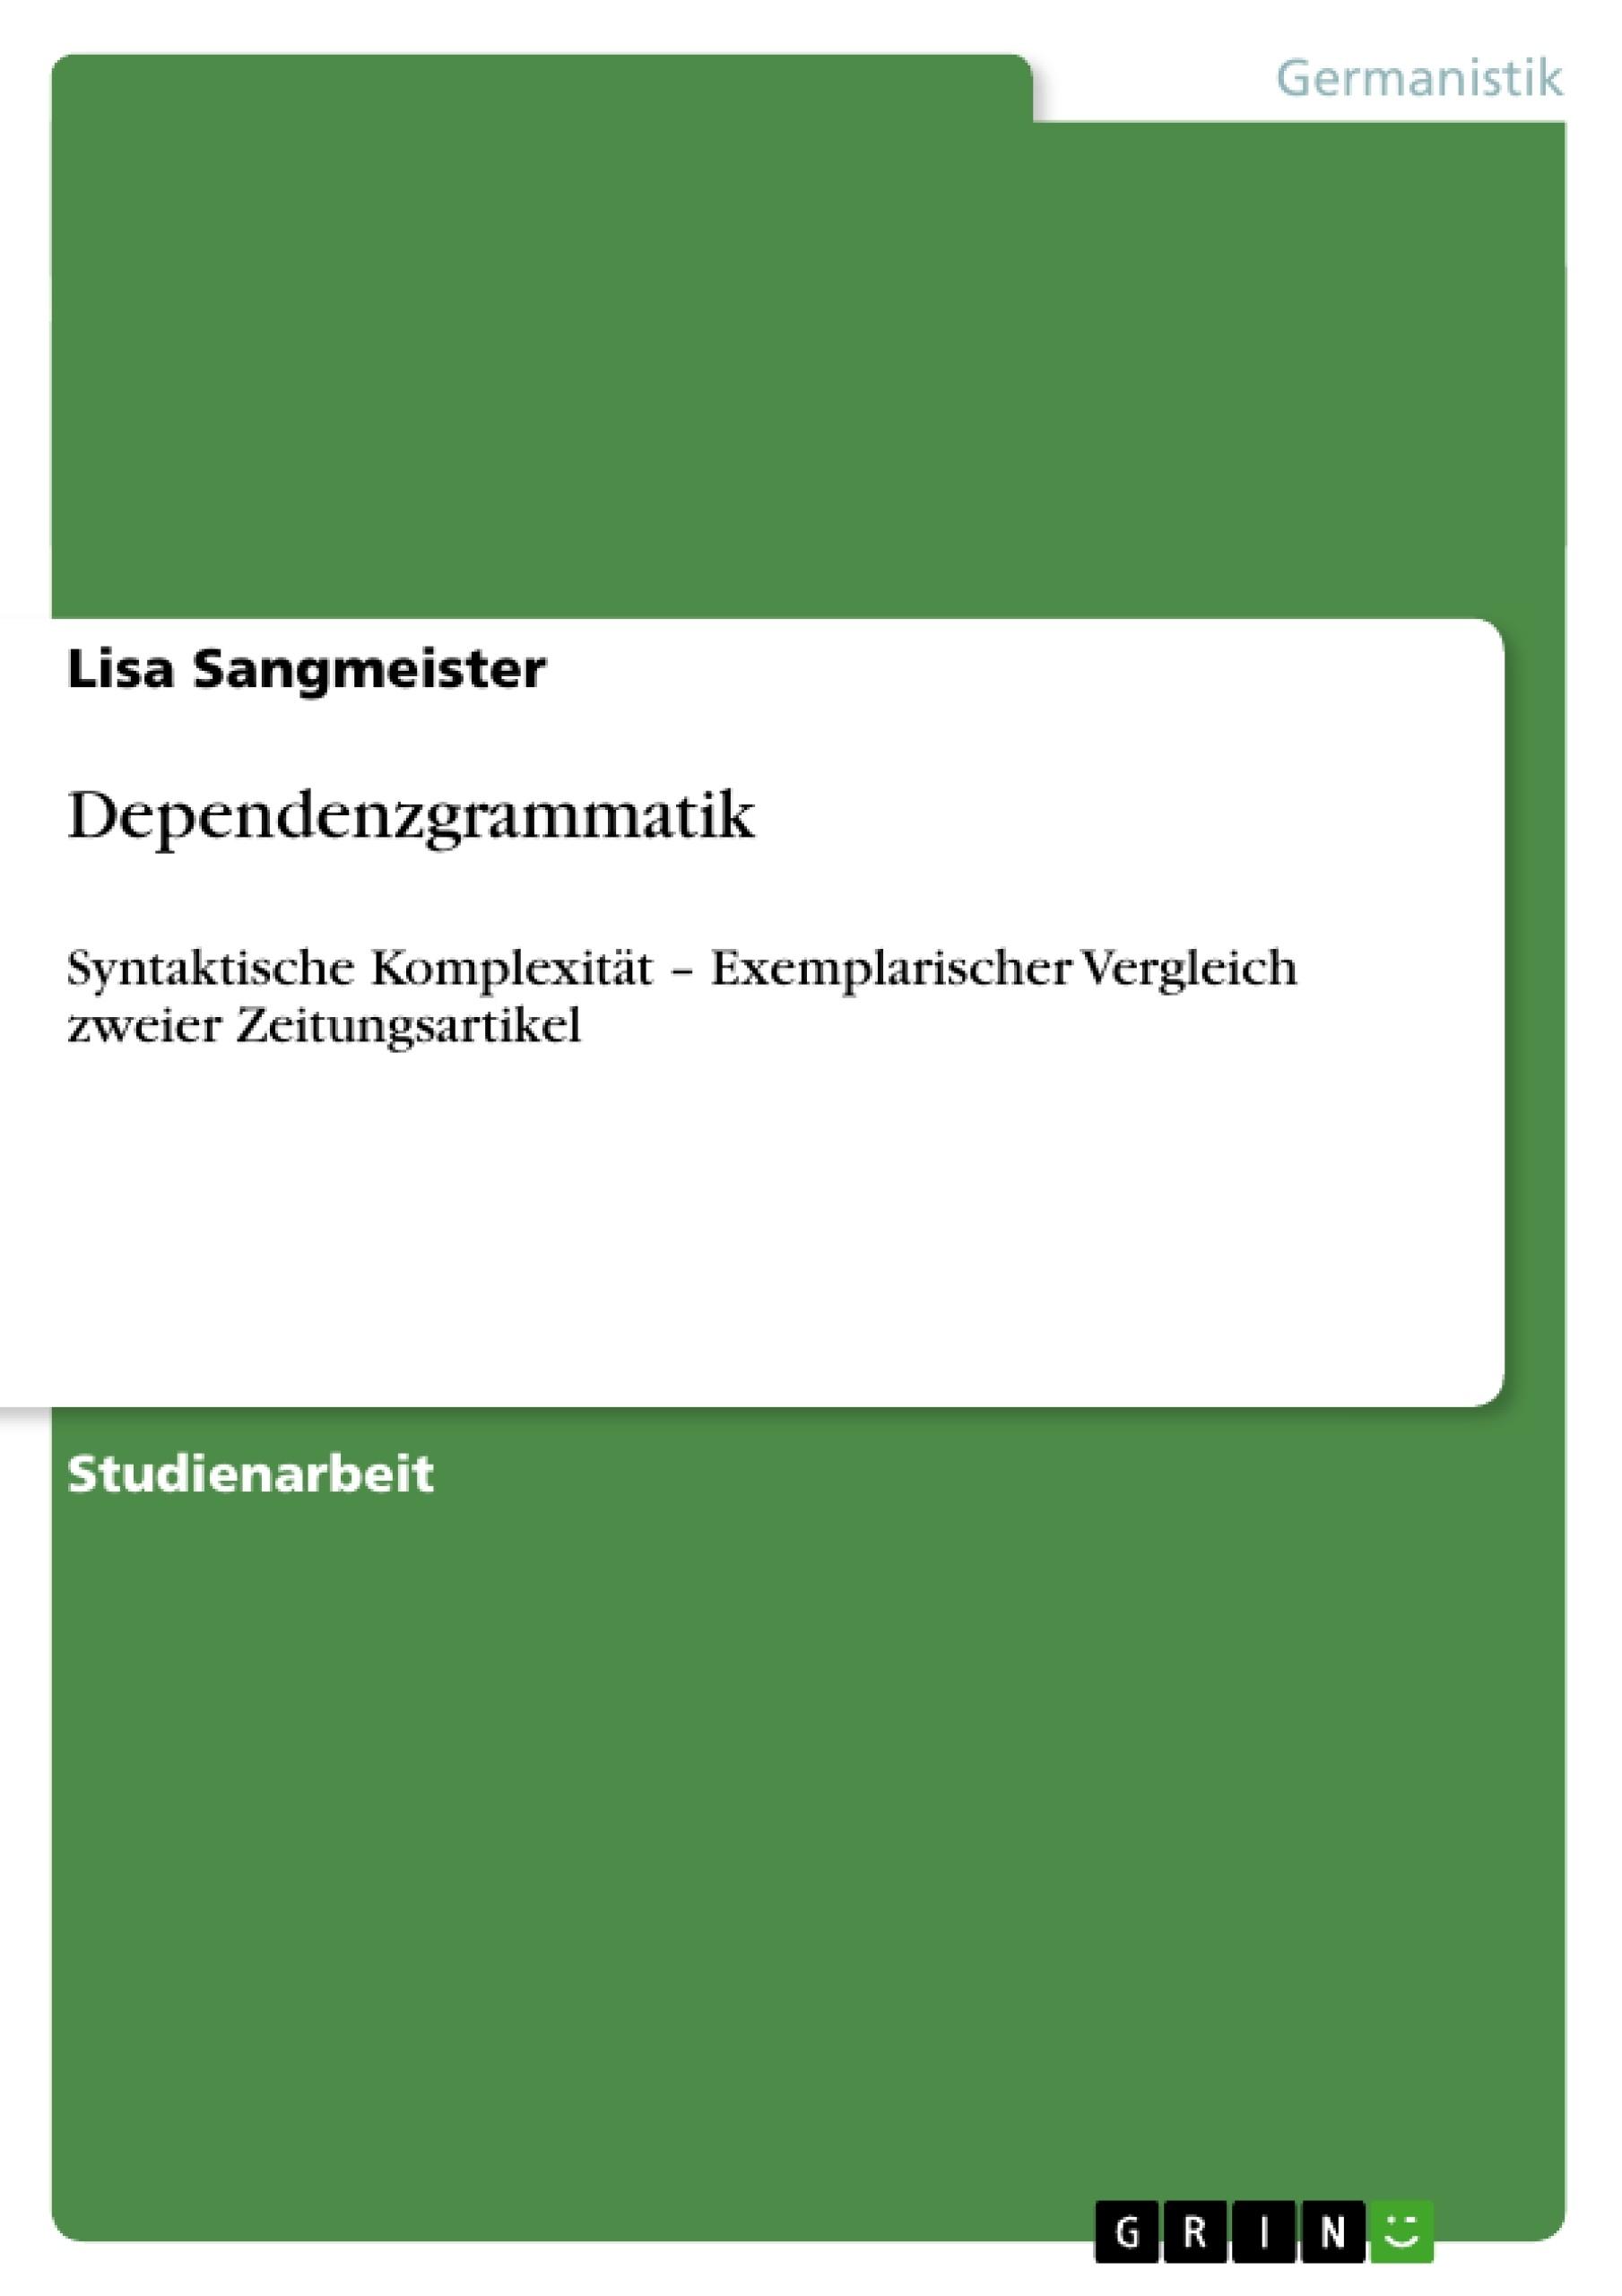 Titel: Dependenzgrammatik